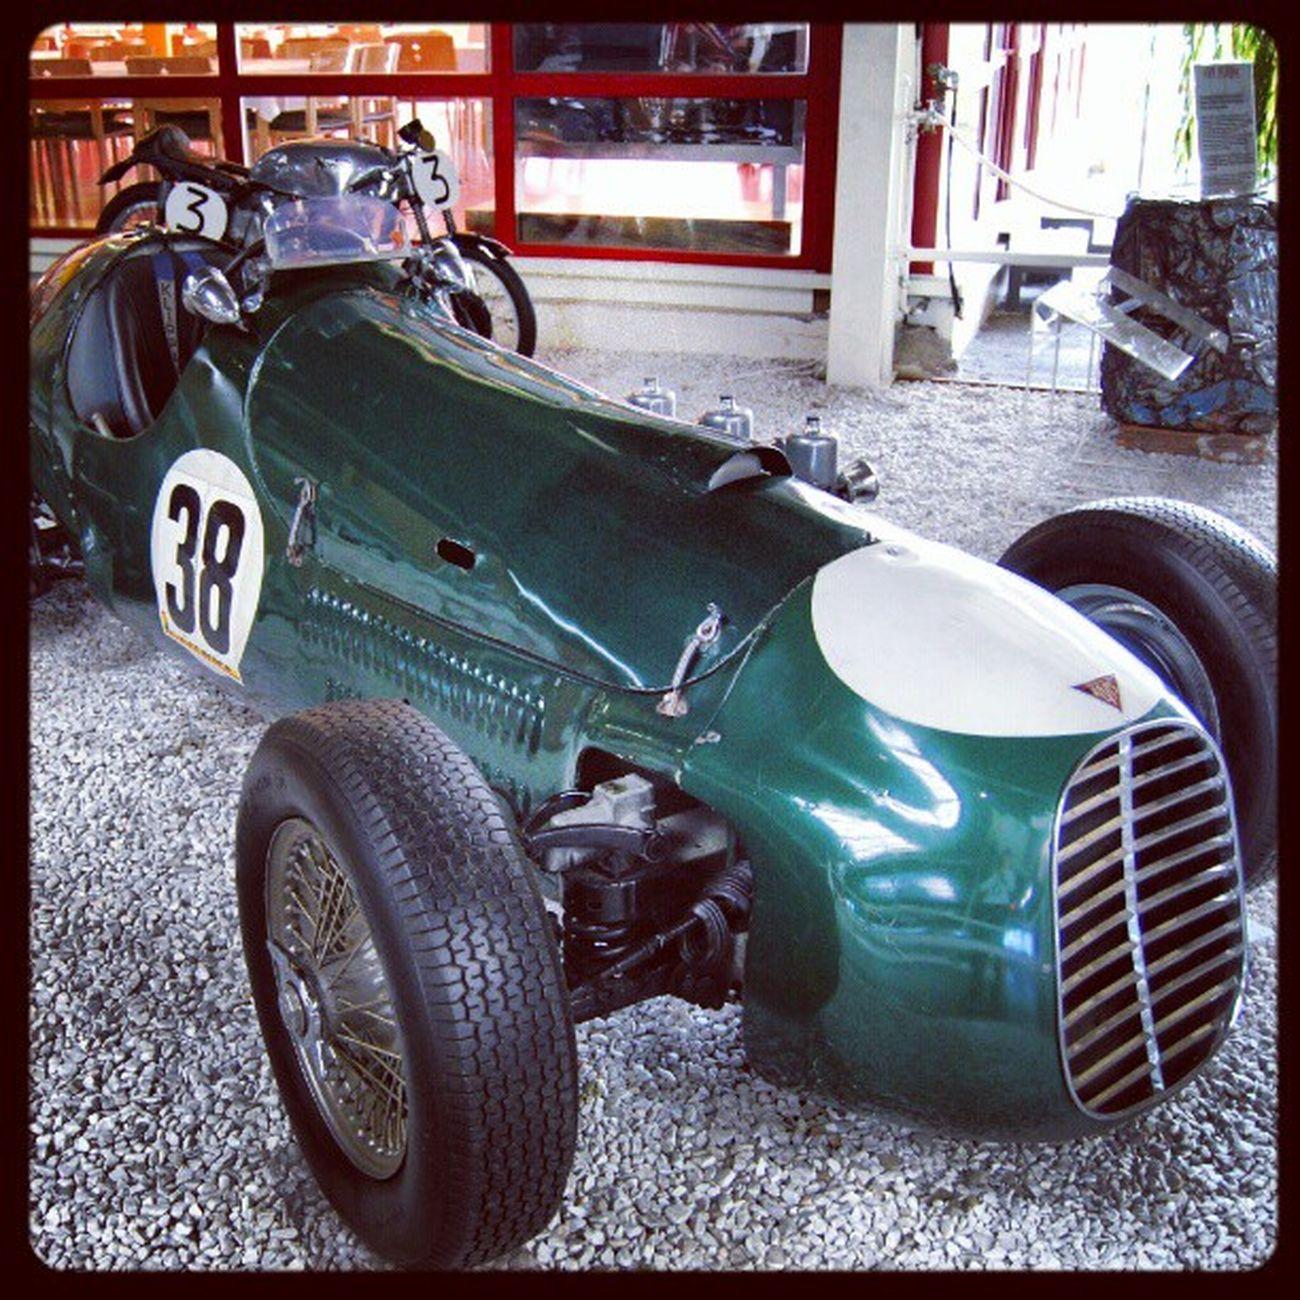 #sinsheim #car #oldtimer #igers #igfamos #instgramm #instagood Car Oldtimer Igers Instagood Sinsheim Igfamos Instgramm